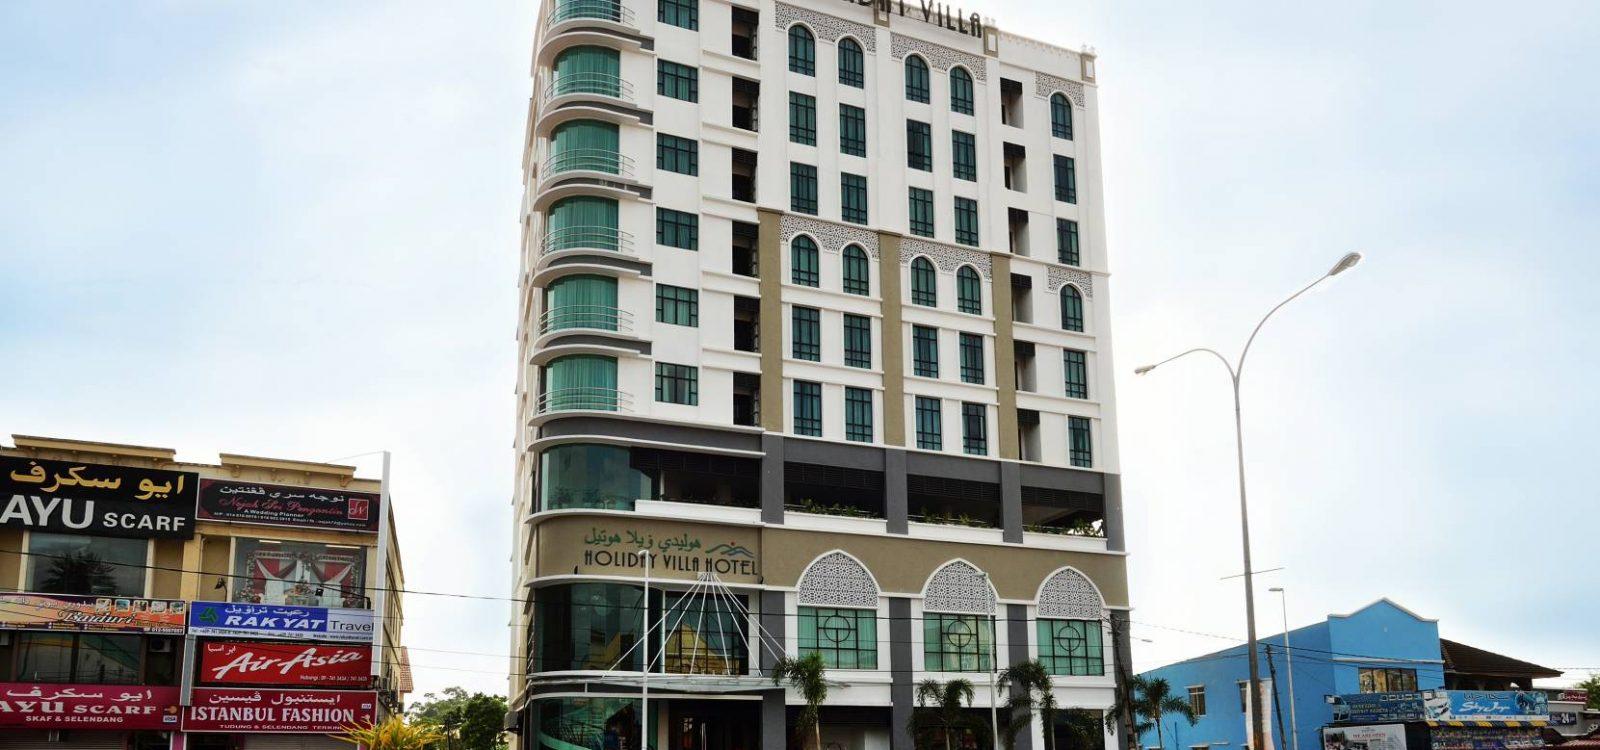 Holiday Villa Hotel & Suites Kota Bharu Kelantan | Kota